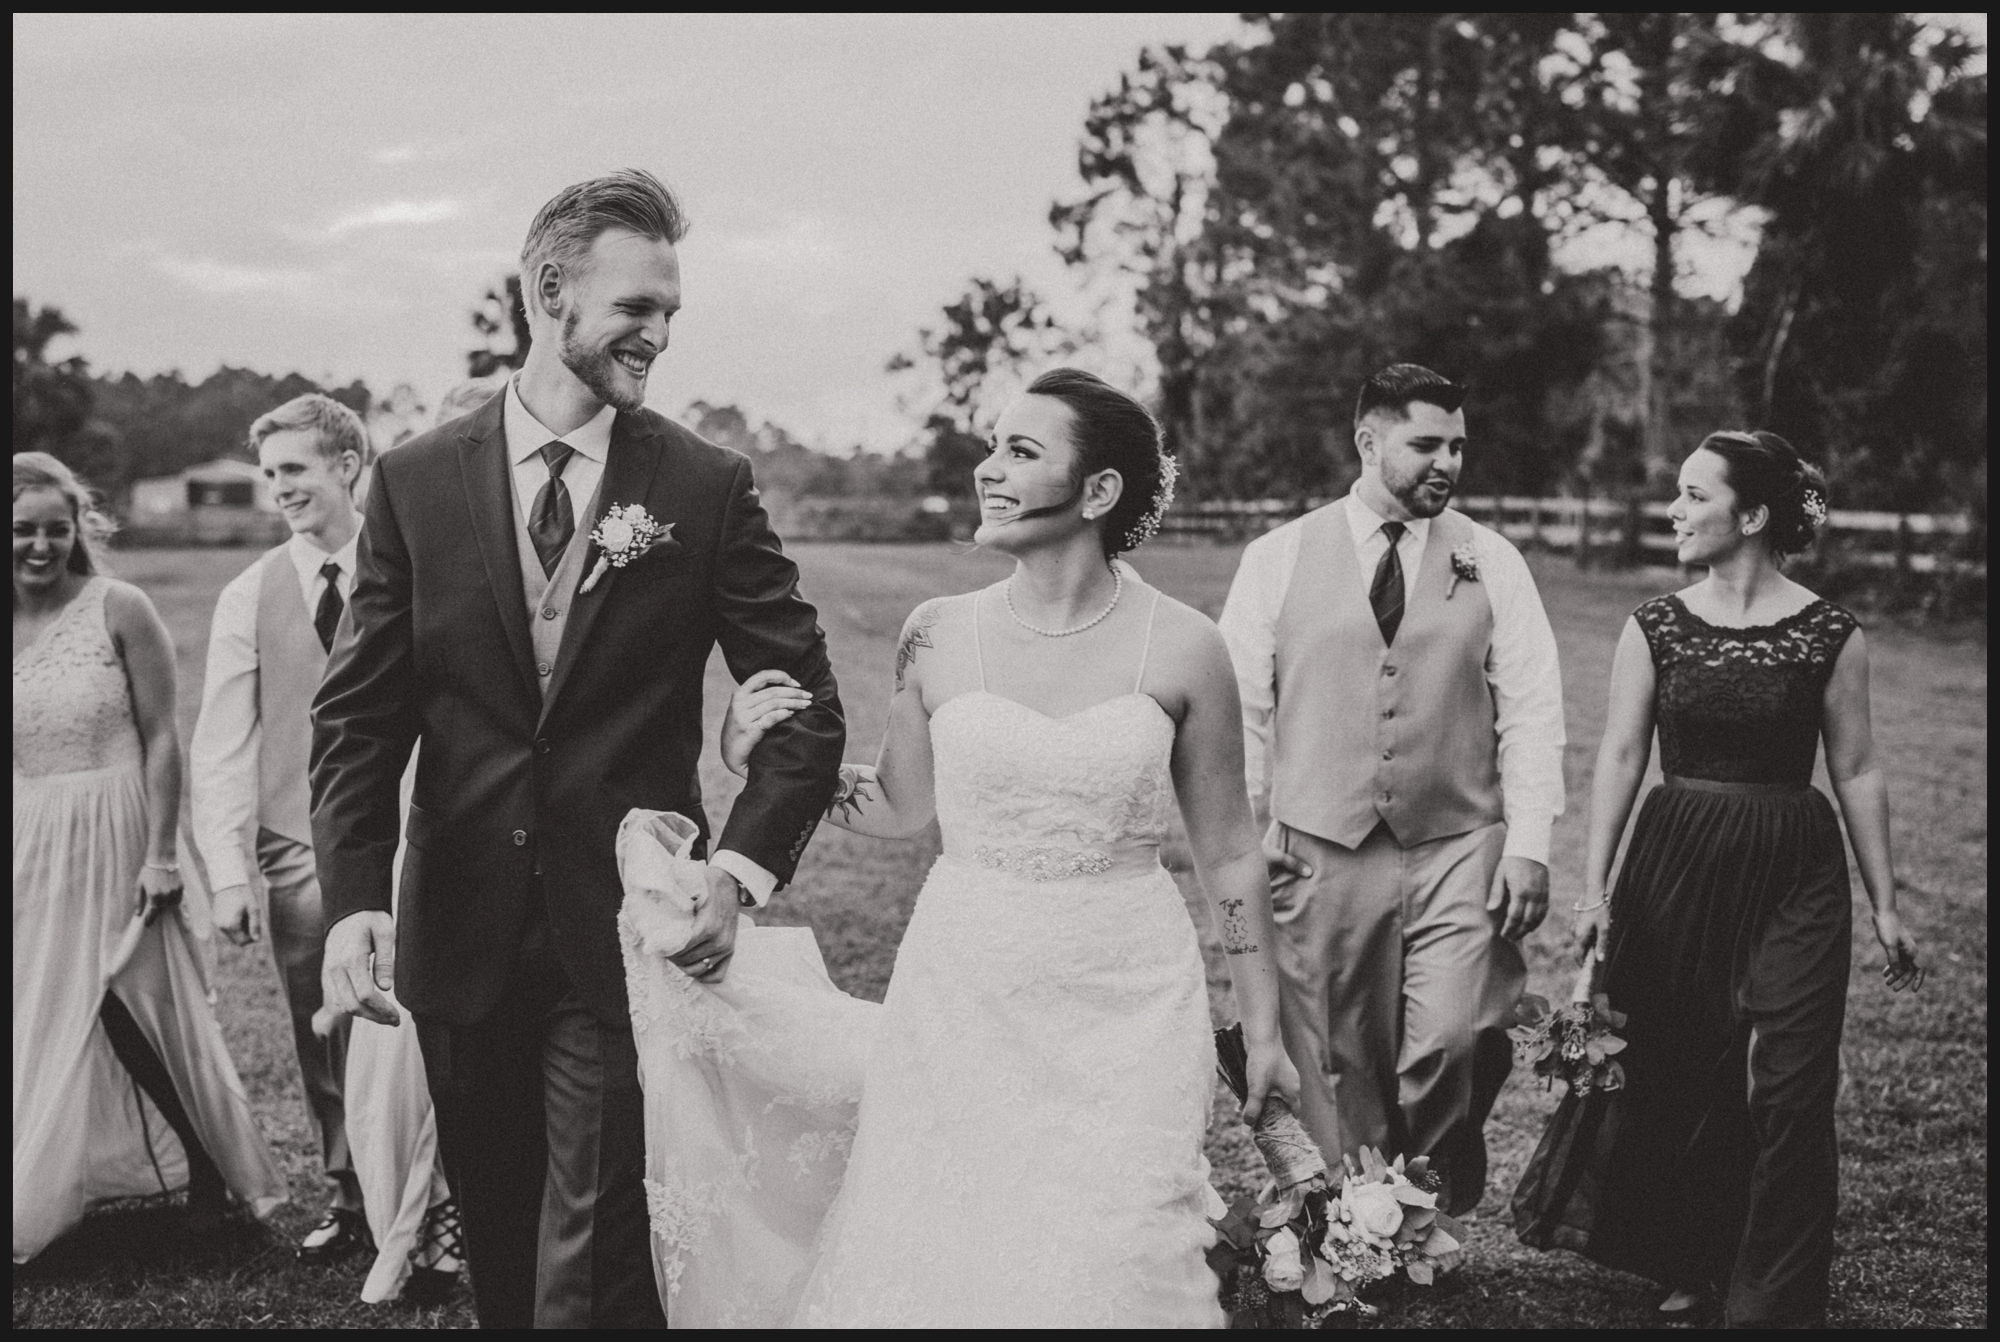 Orlando-Wedding-Photographer-destination-wedding-photographer-florida-wedding-photographer-bohemian-wedding-photographer_0356.jpg